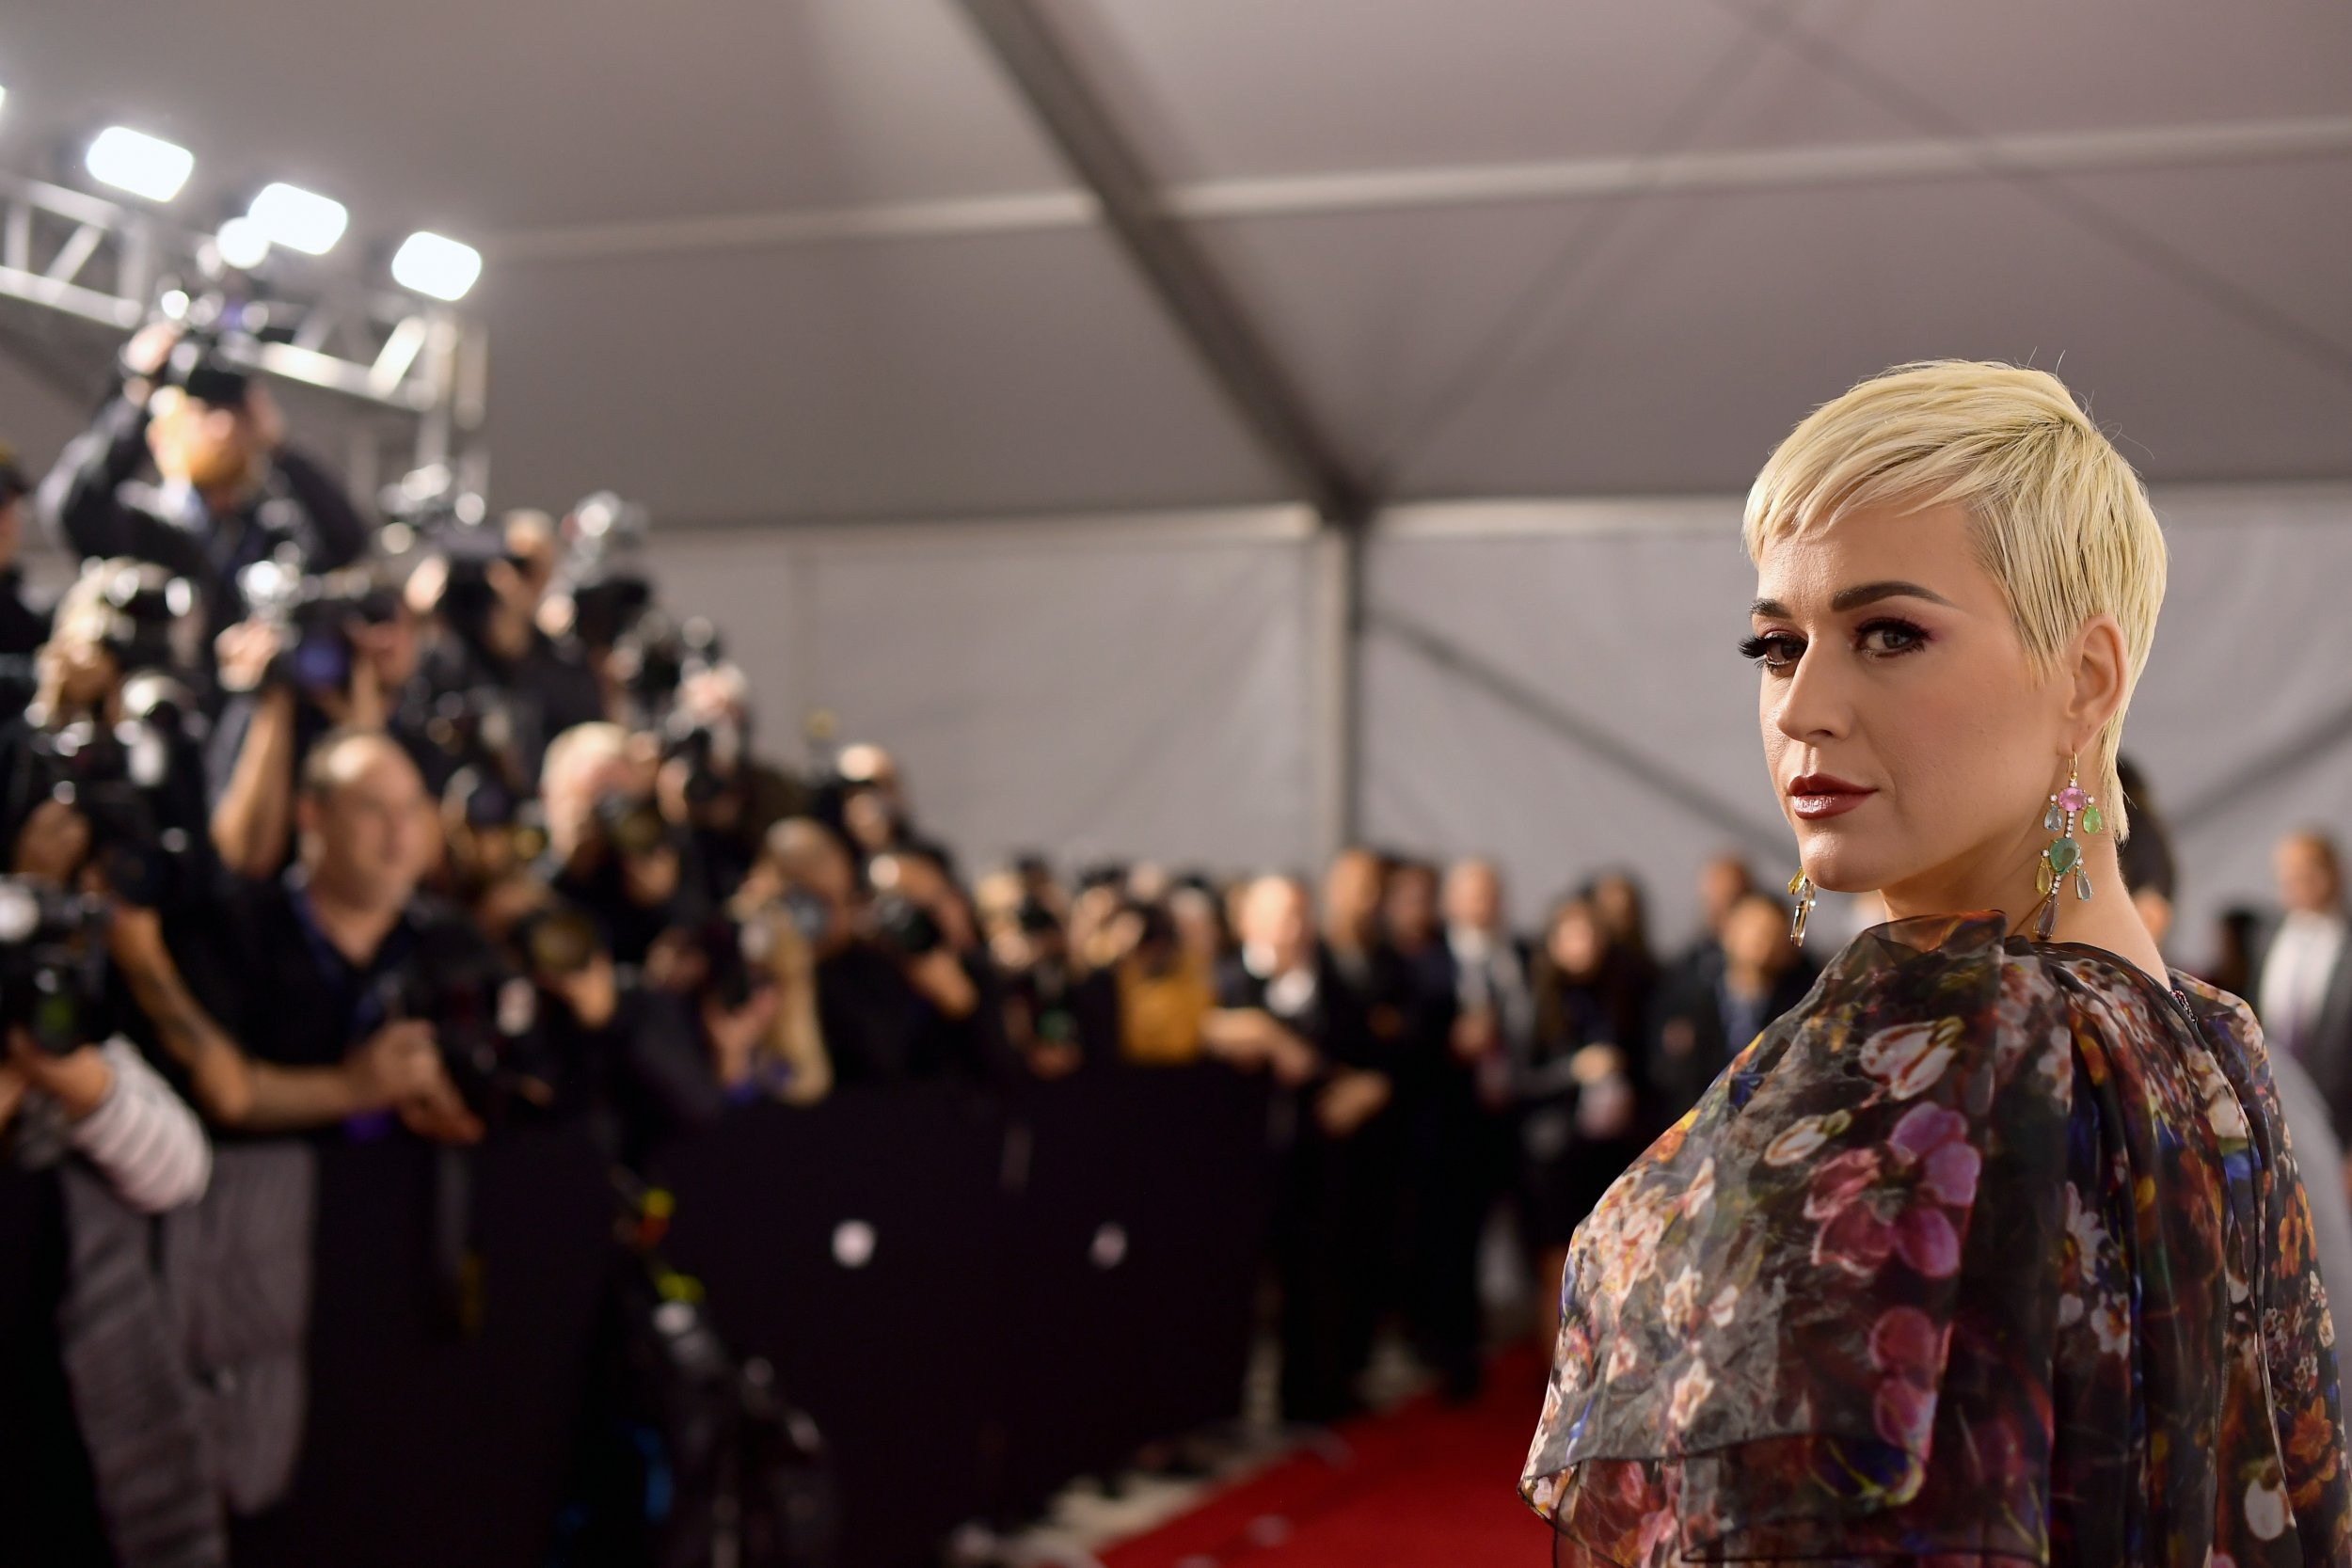 Katy Perry Shoes 'Not Blackface,' Daymond John Says